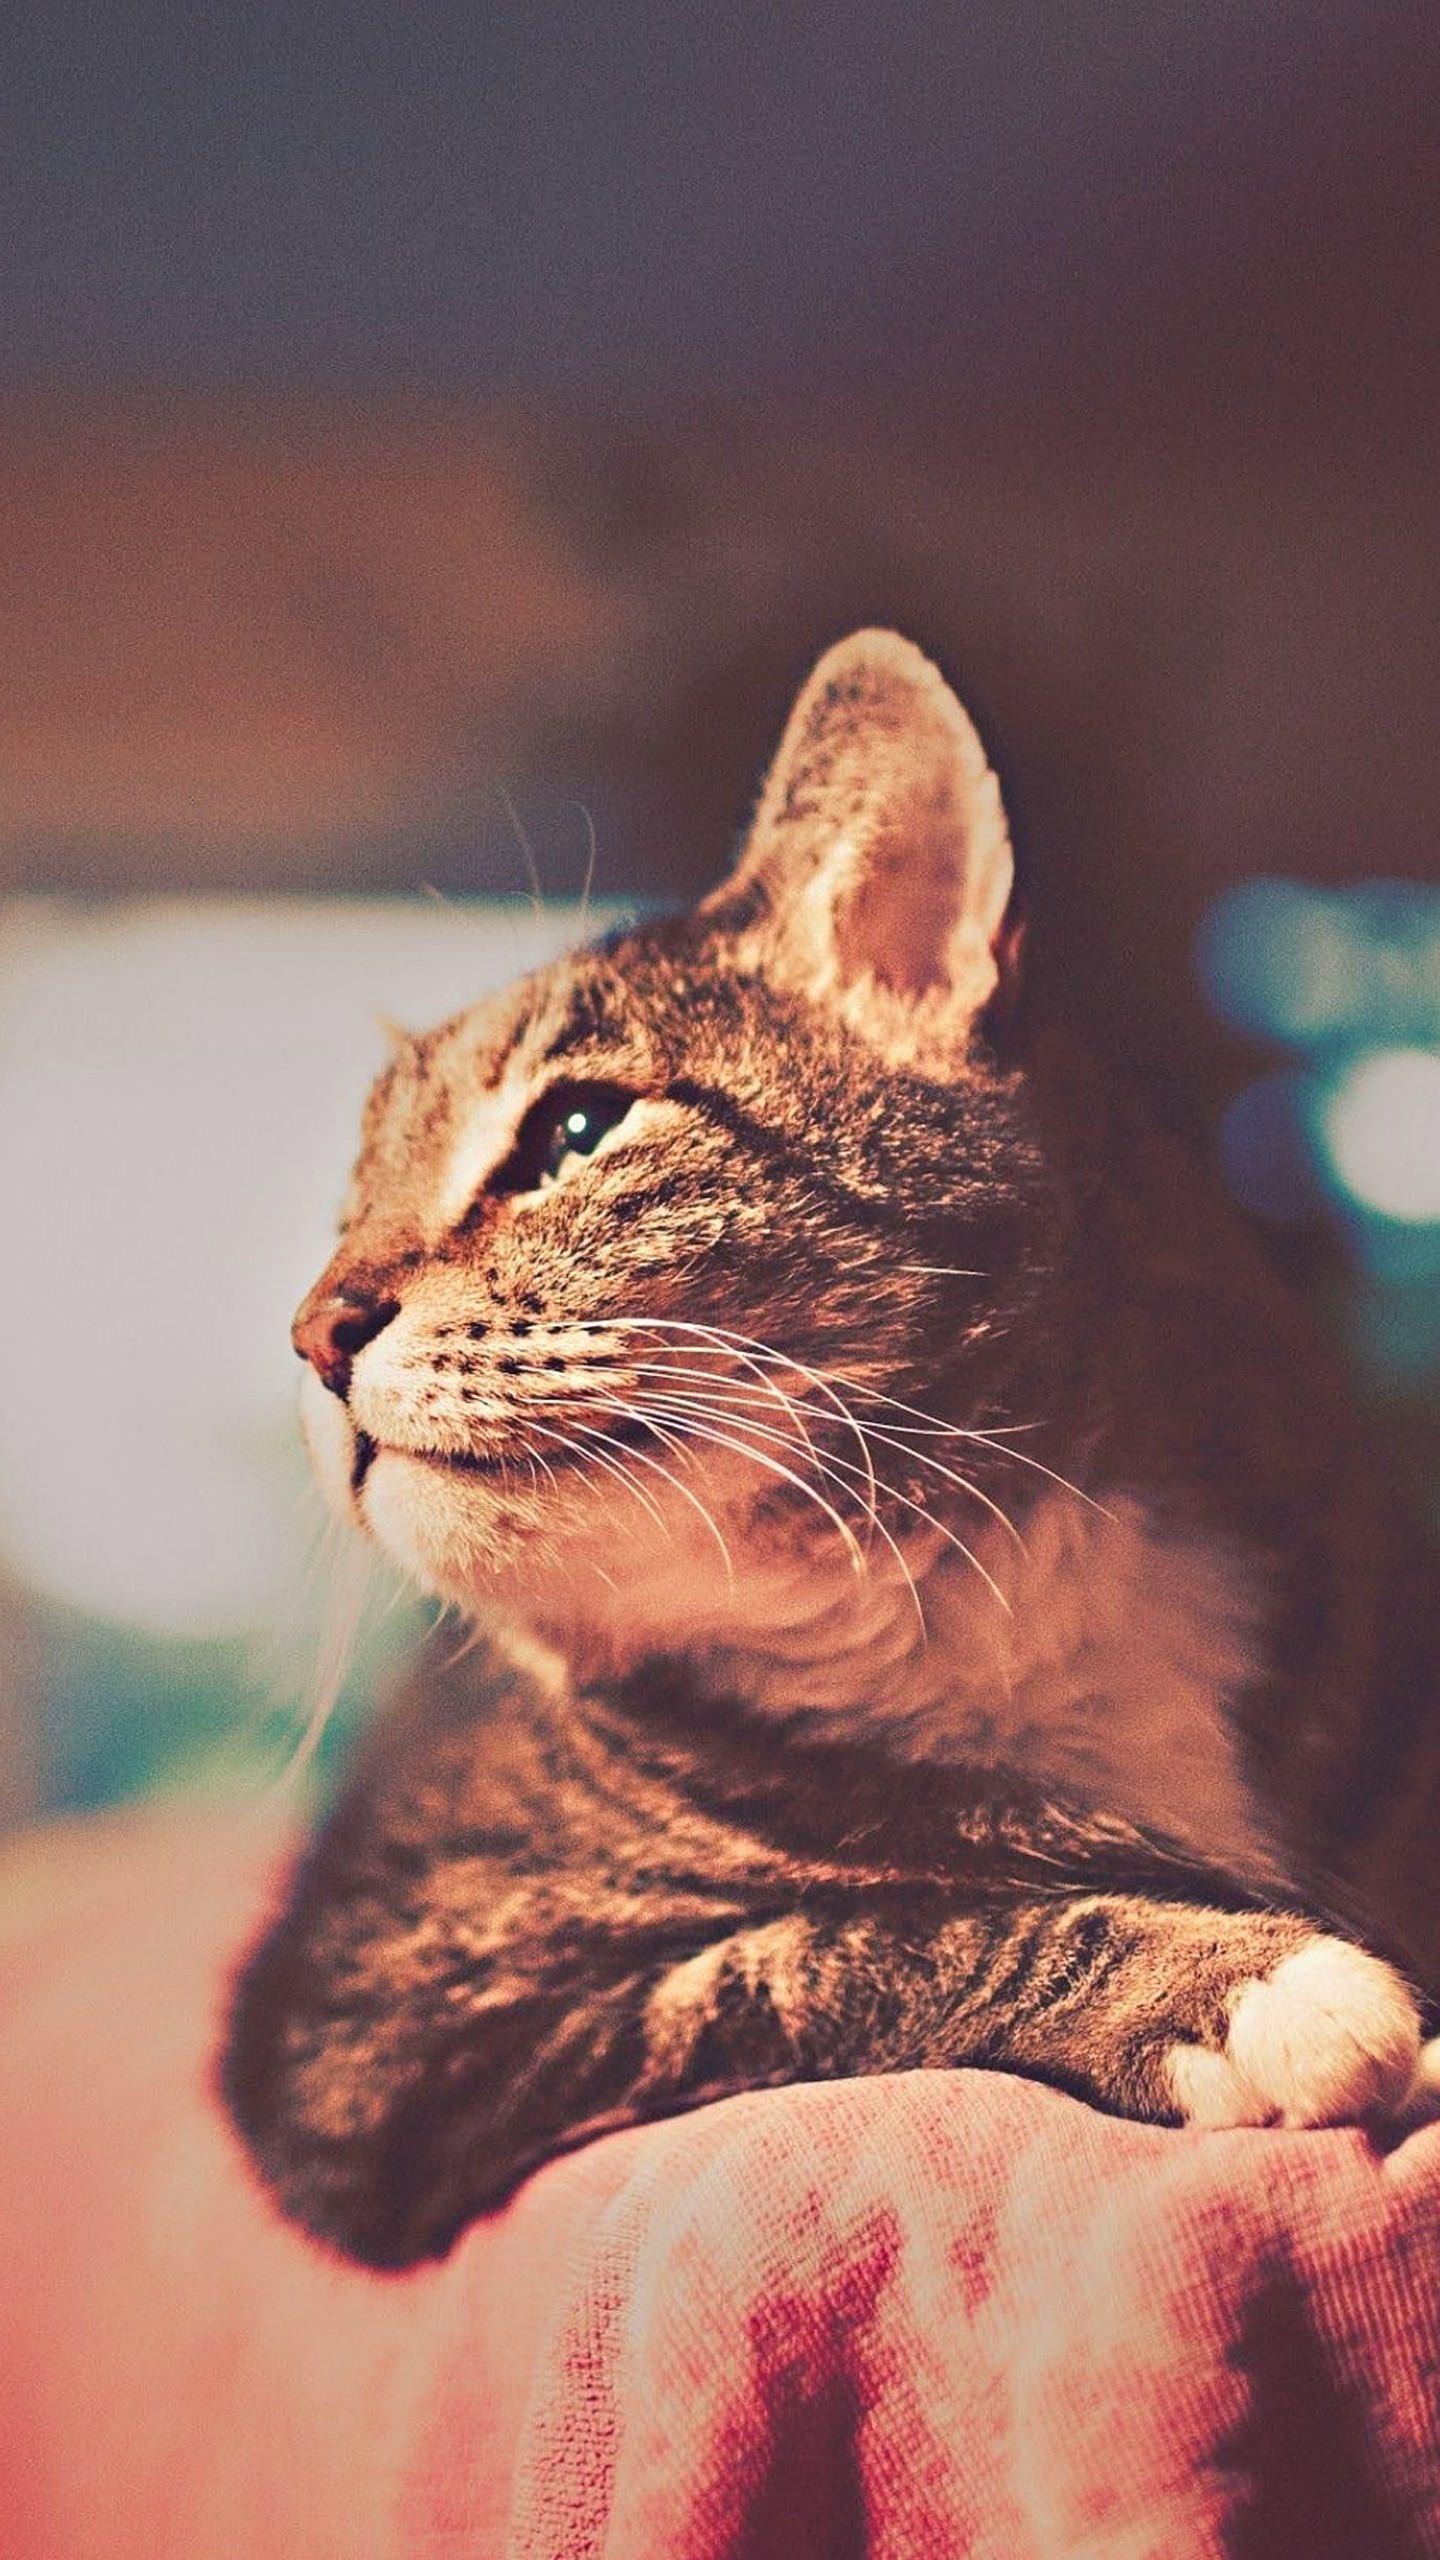 Cool Cat Wallpaper Sc Smartphone